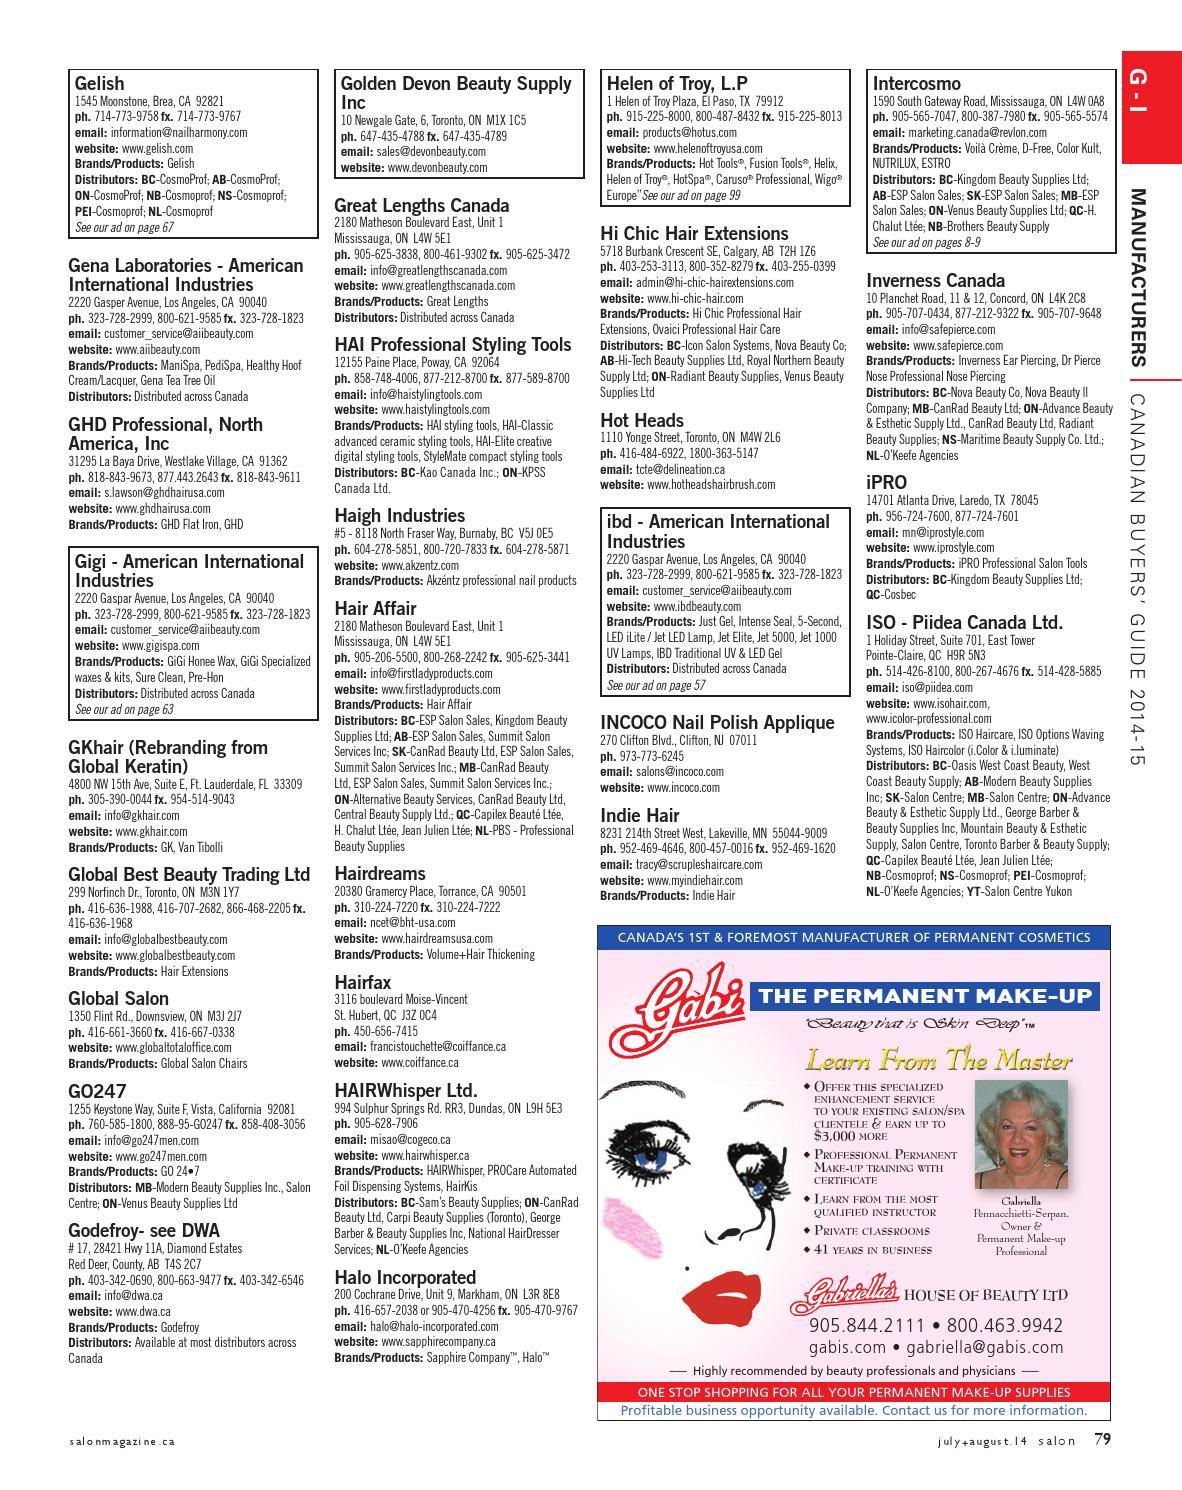 Salon Magazine, July/August 2014